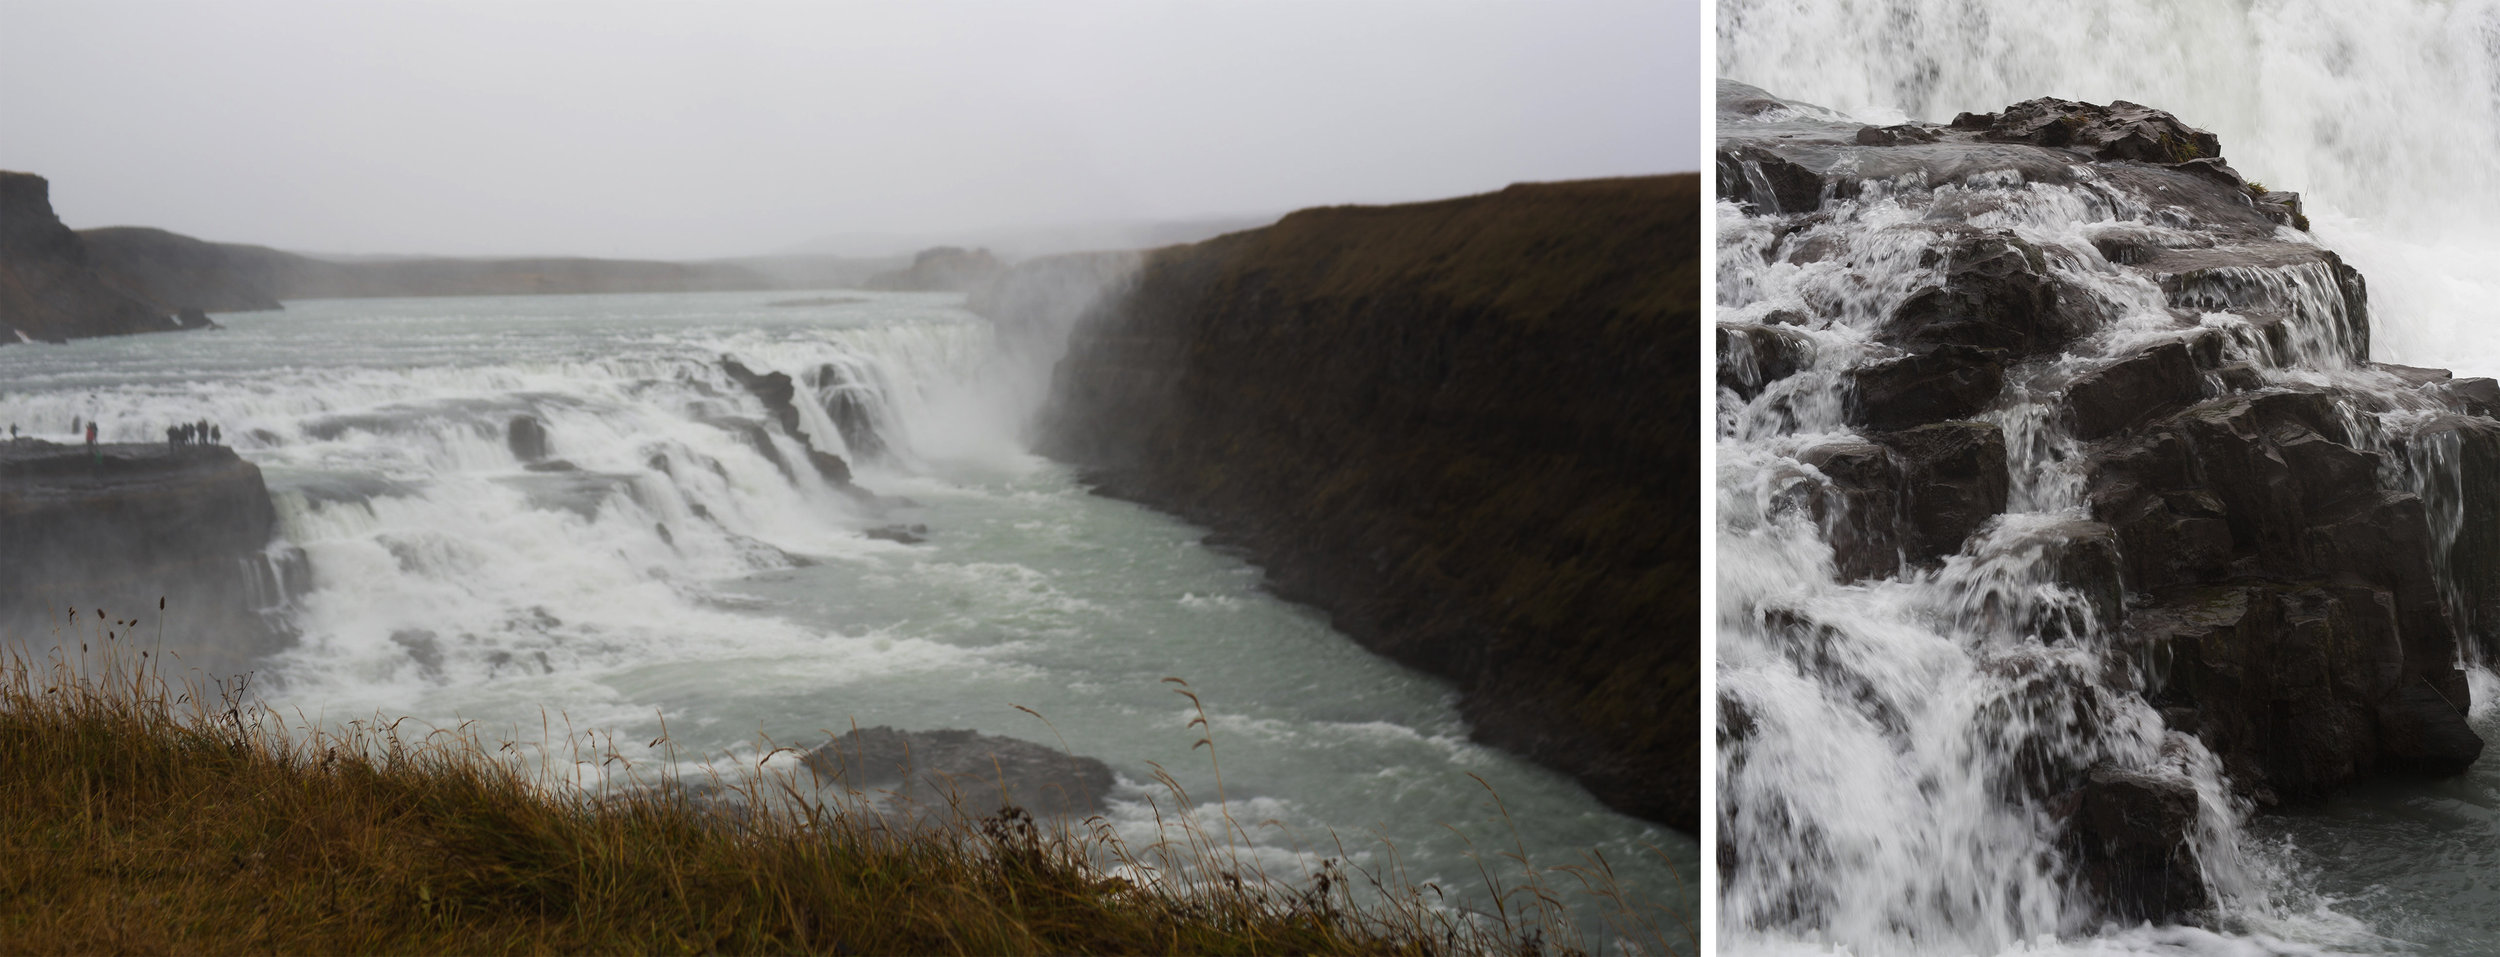 Icelandblog-15.jpg